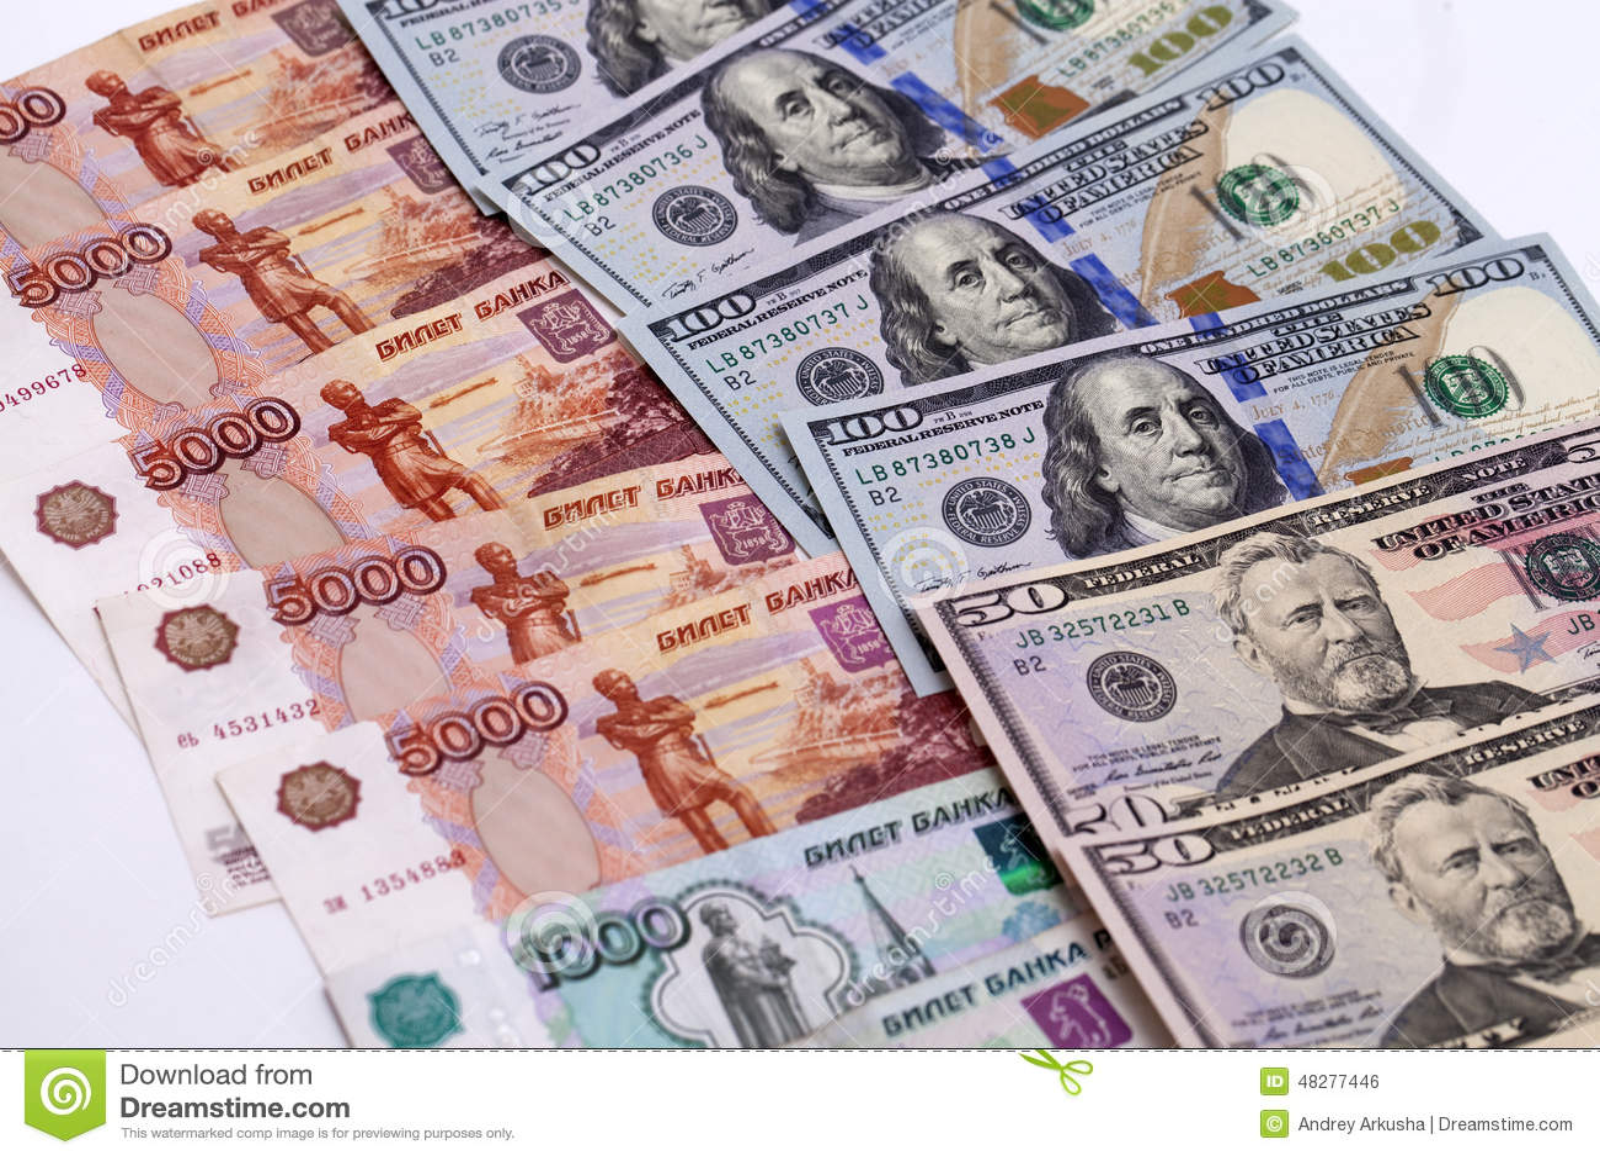 Rubles to dollar камаз туркменистан